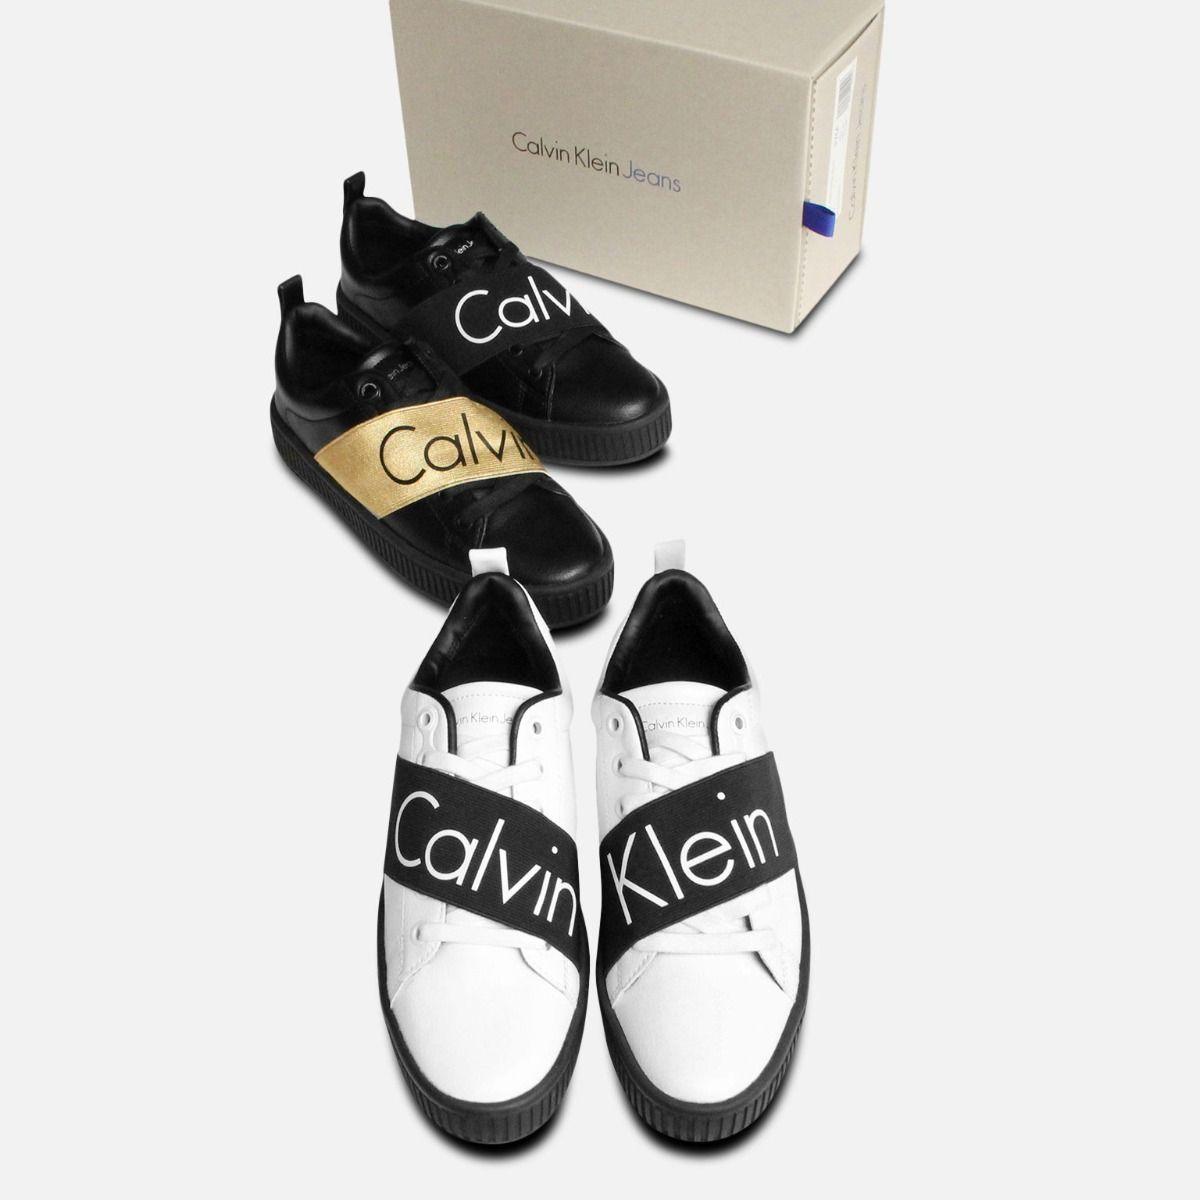 Exclusive Gold & Black Calvin Klein Antonia Shoes